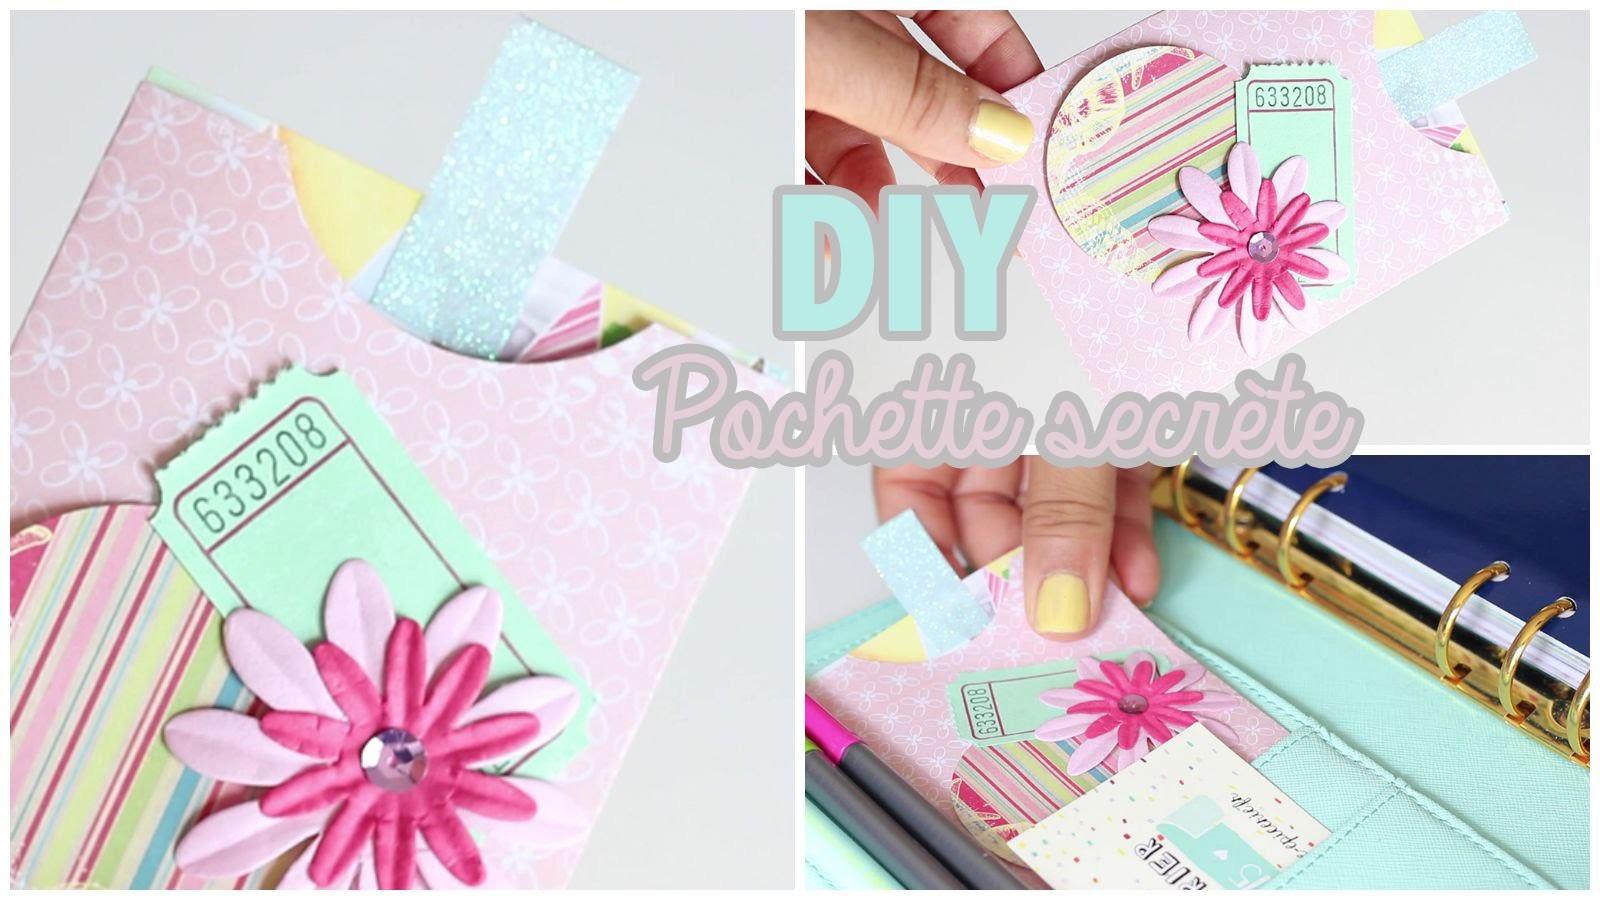 DIY # TUTO Paper craft : Pochette secrète